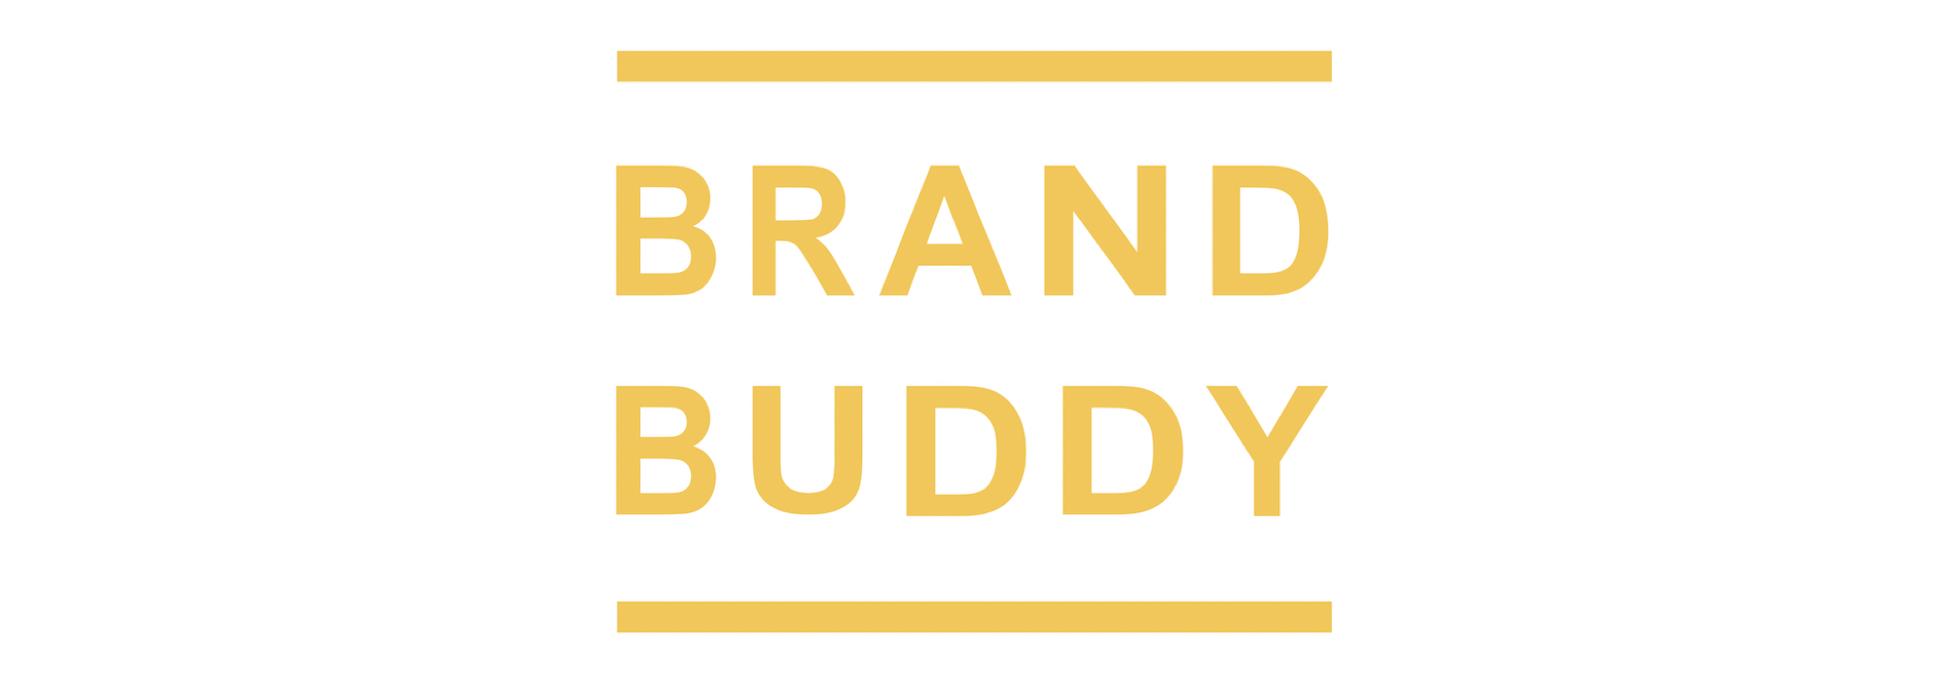 BrandBuddy_laaja logo netti.png